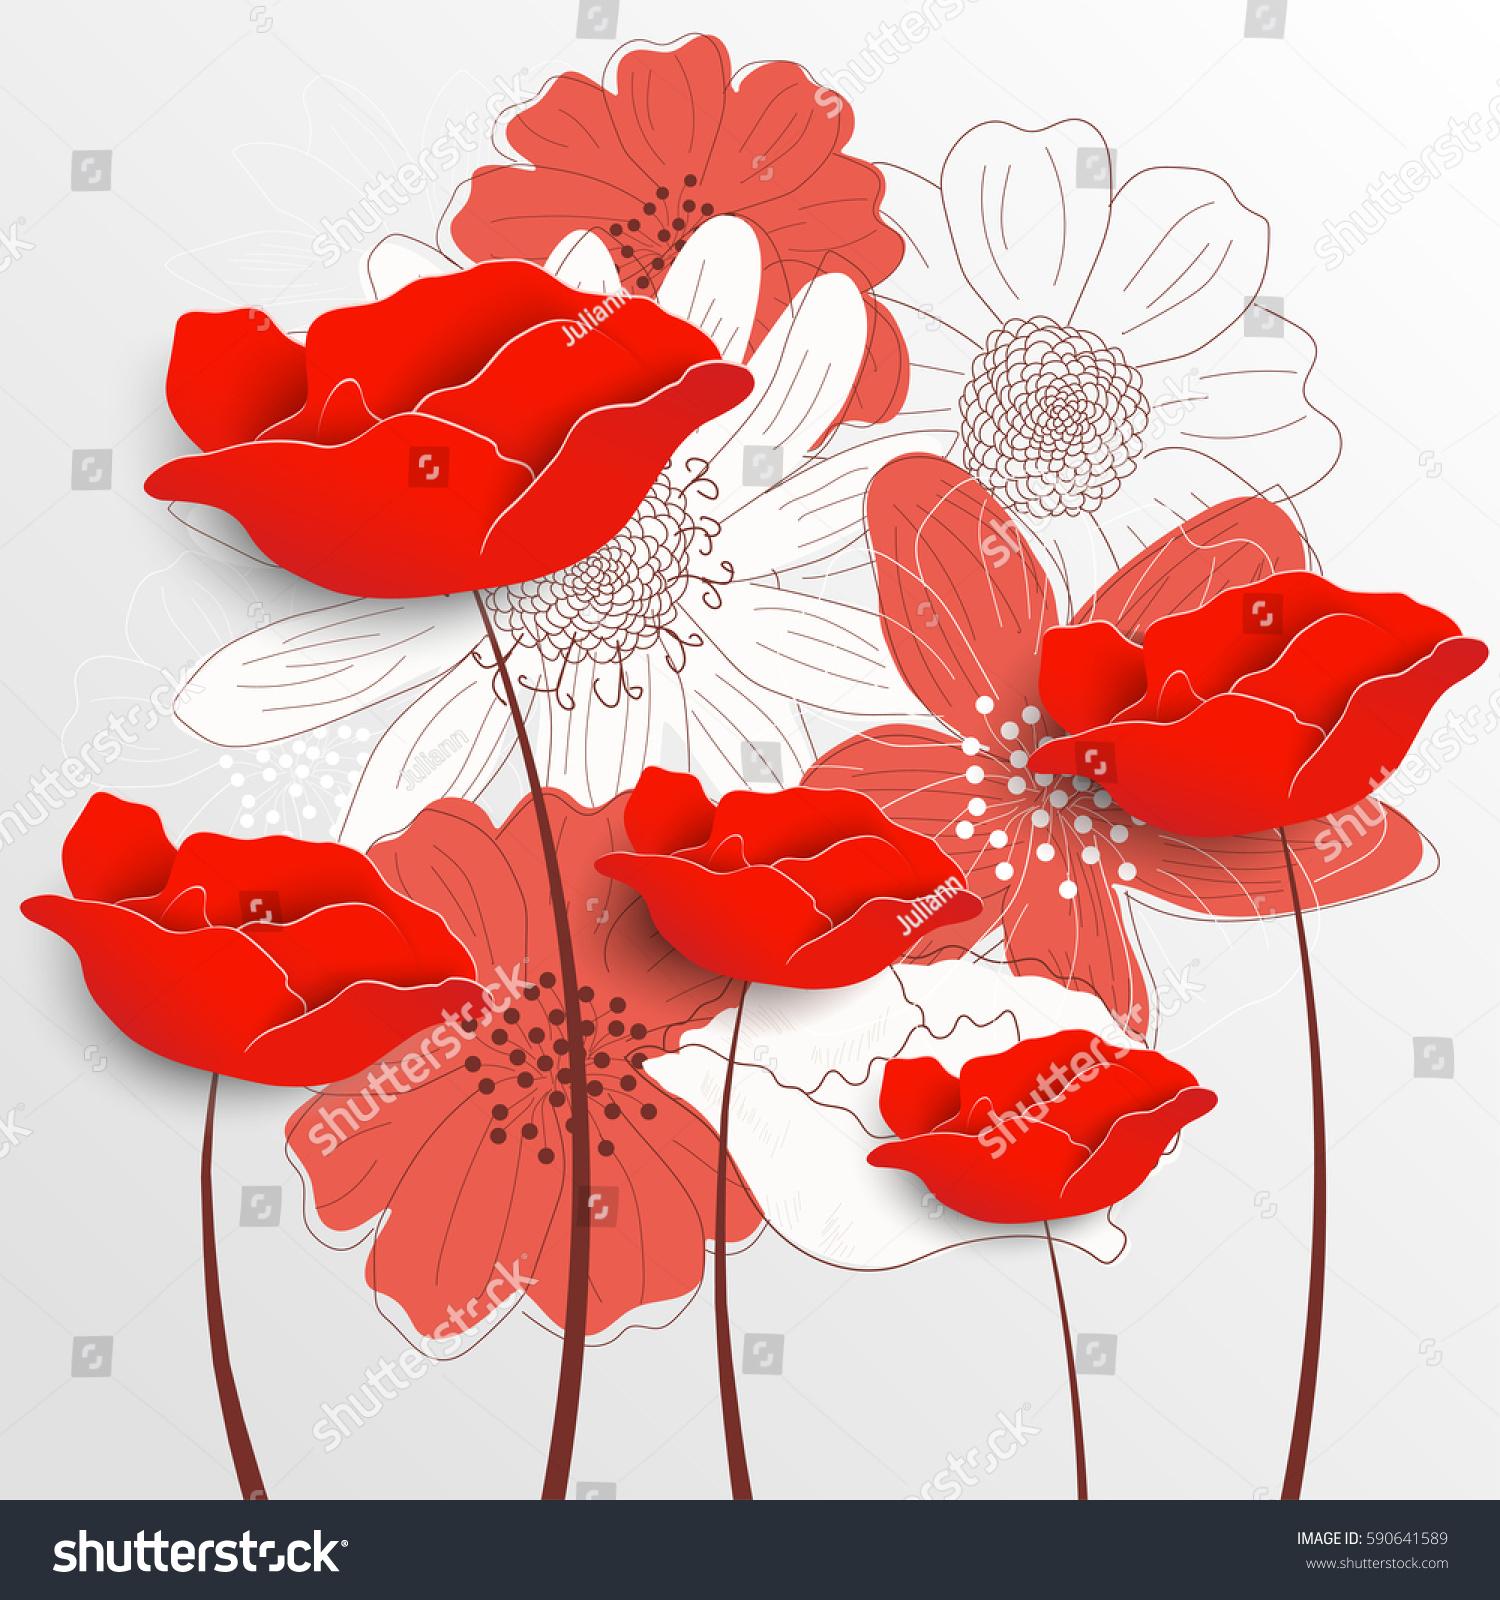 Retro Floral Background Decorative Flowers Romantic Stock Vector